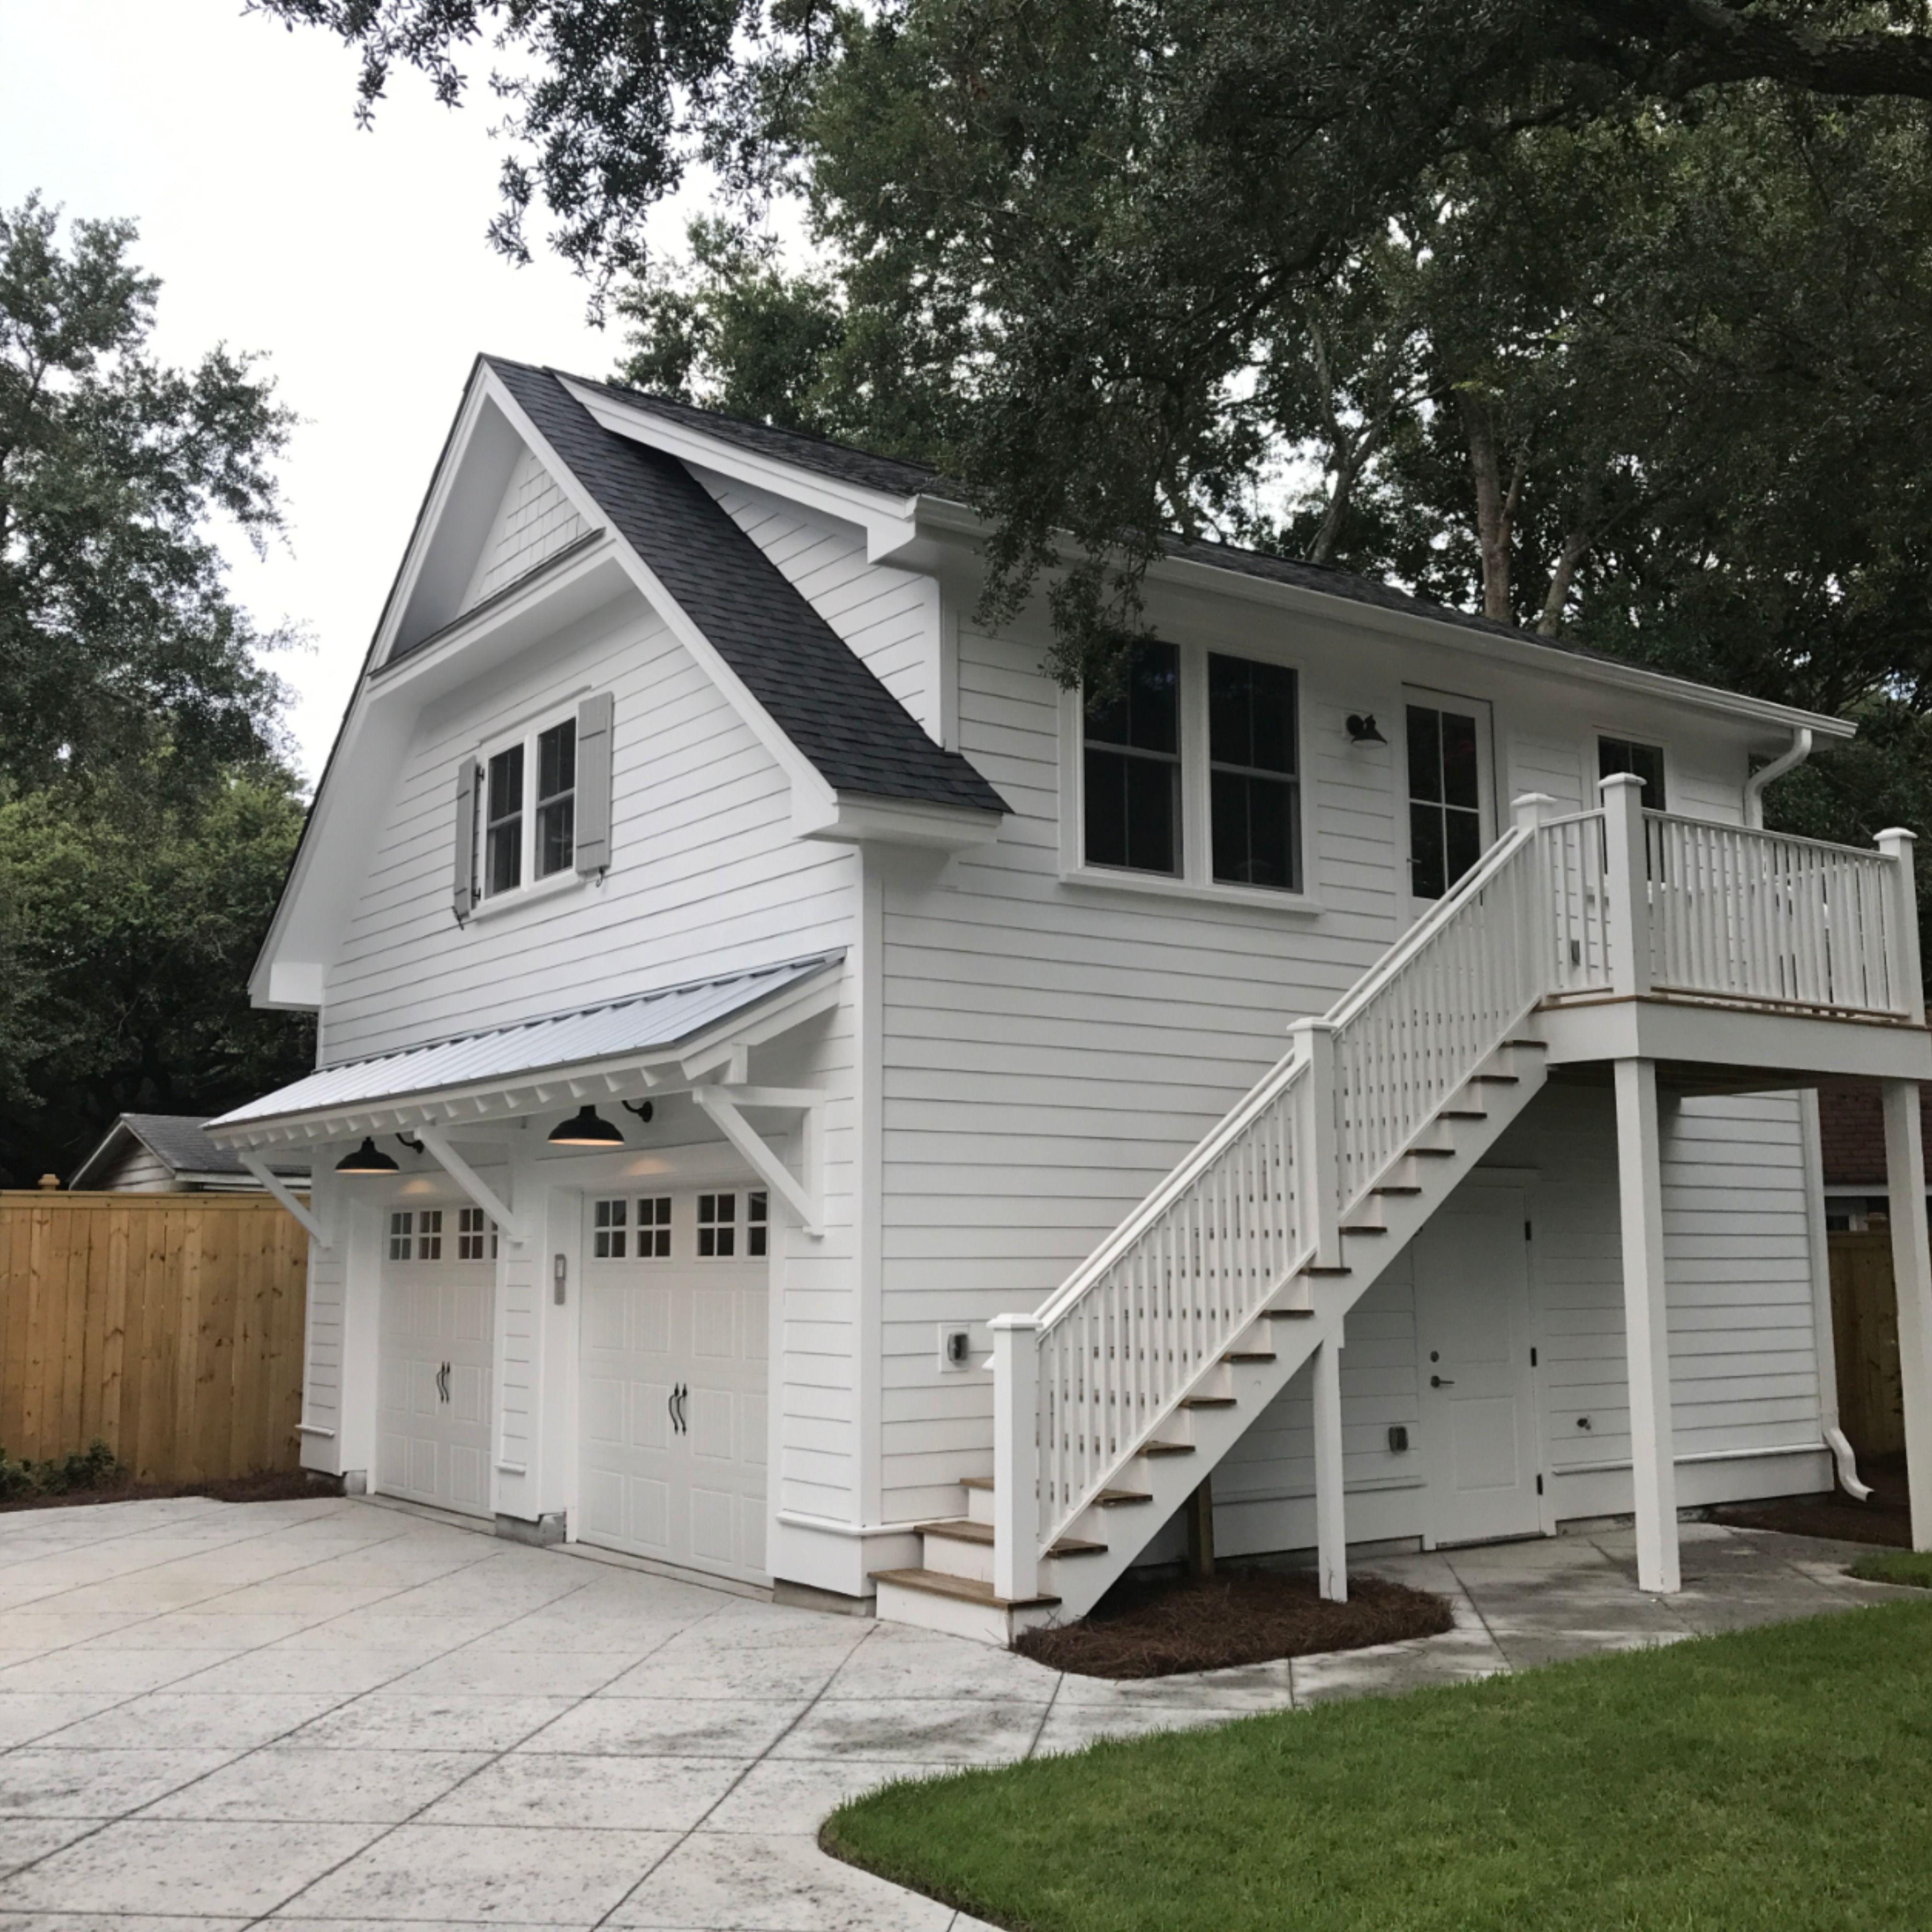 Winthrop Garage/ADU Plan 1 Bedroom in 2020 Carriage